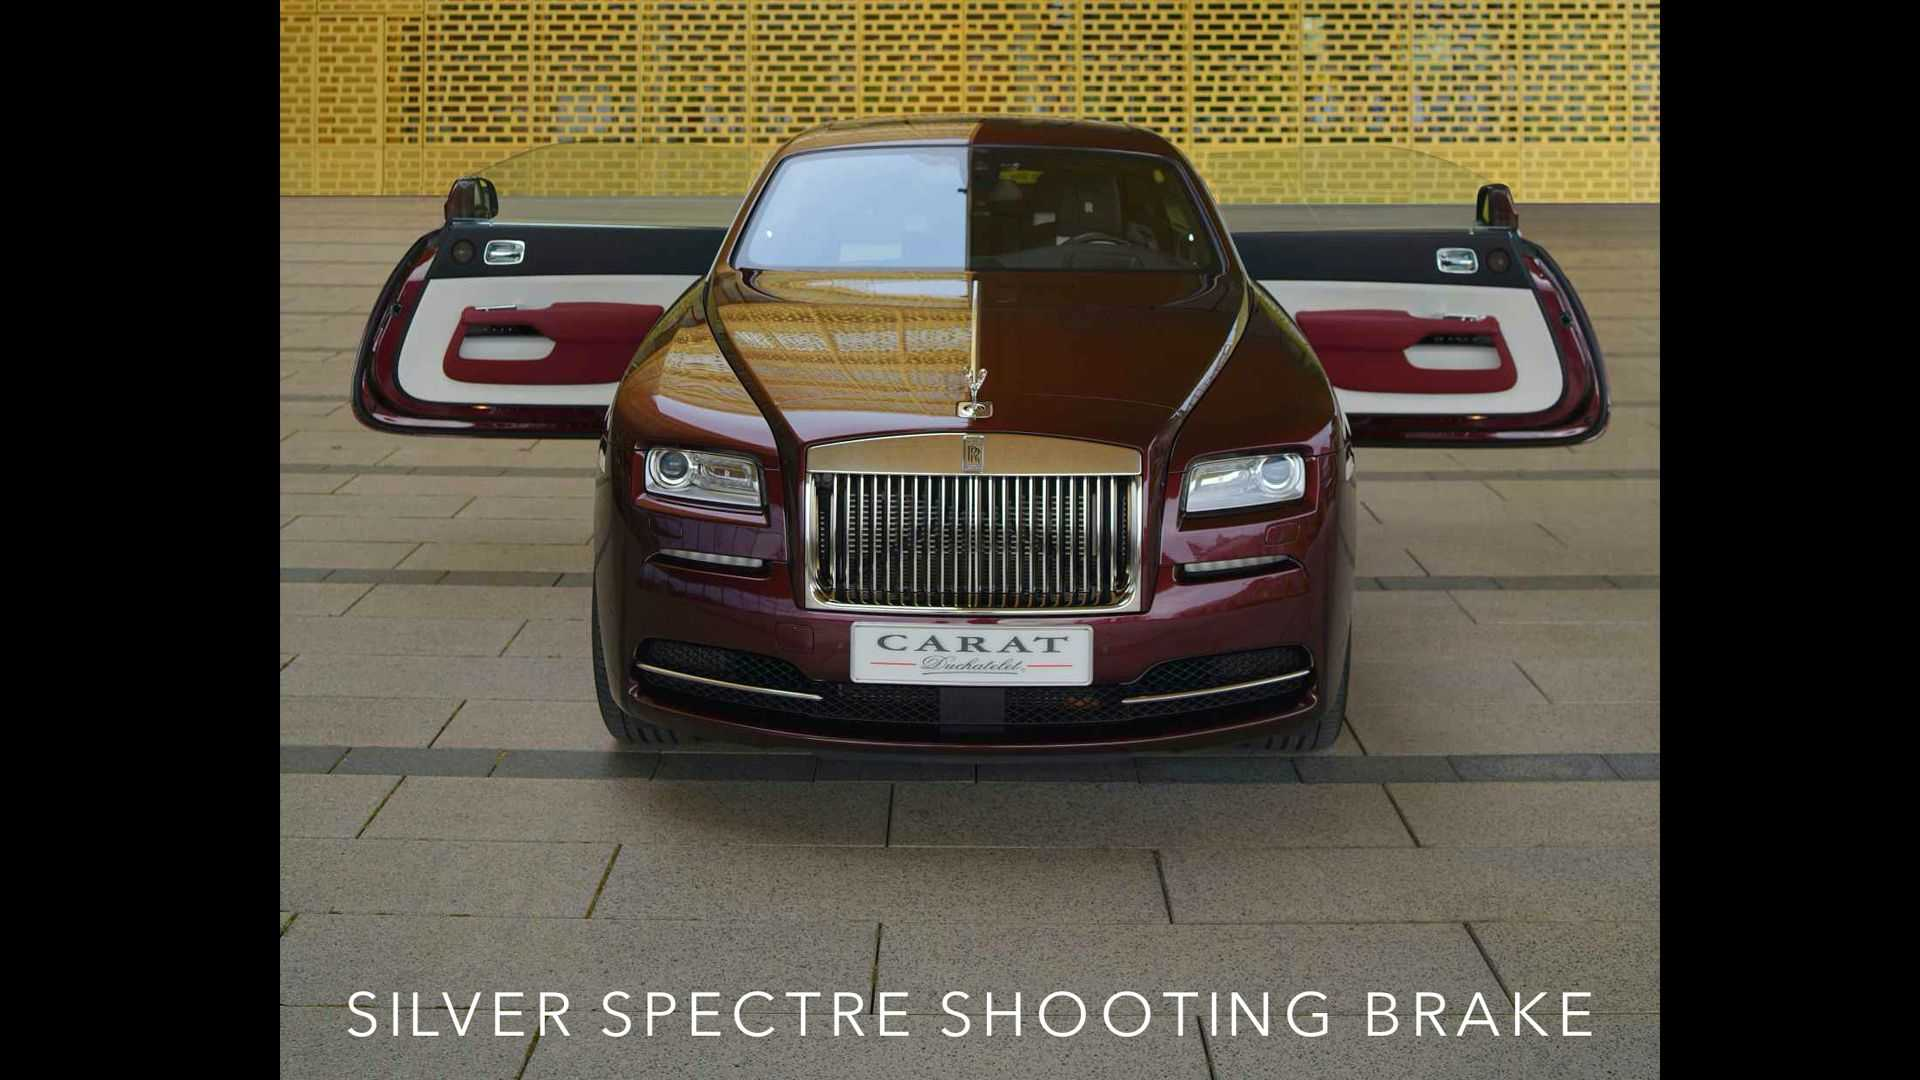 carat-duchatelet-silver-spectre-wraith-shooting-brake (2).jpg